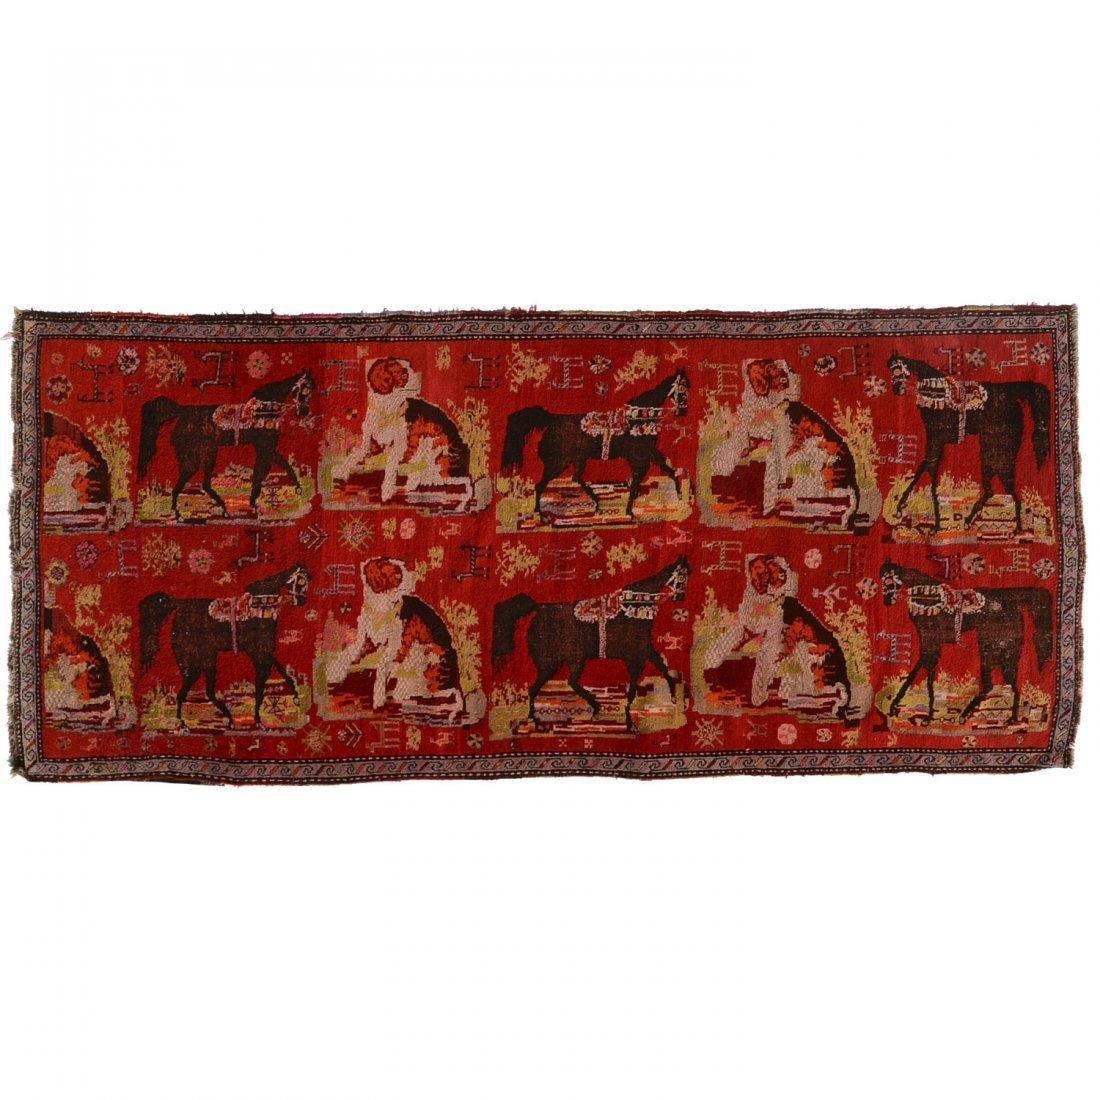 Caucasian European market rug